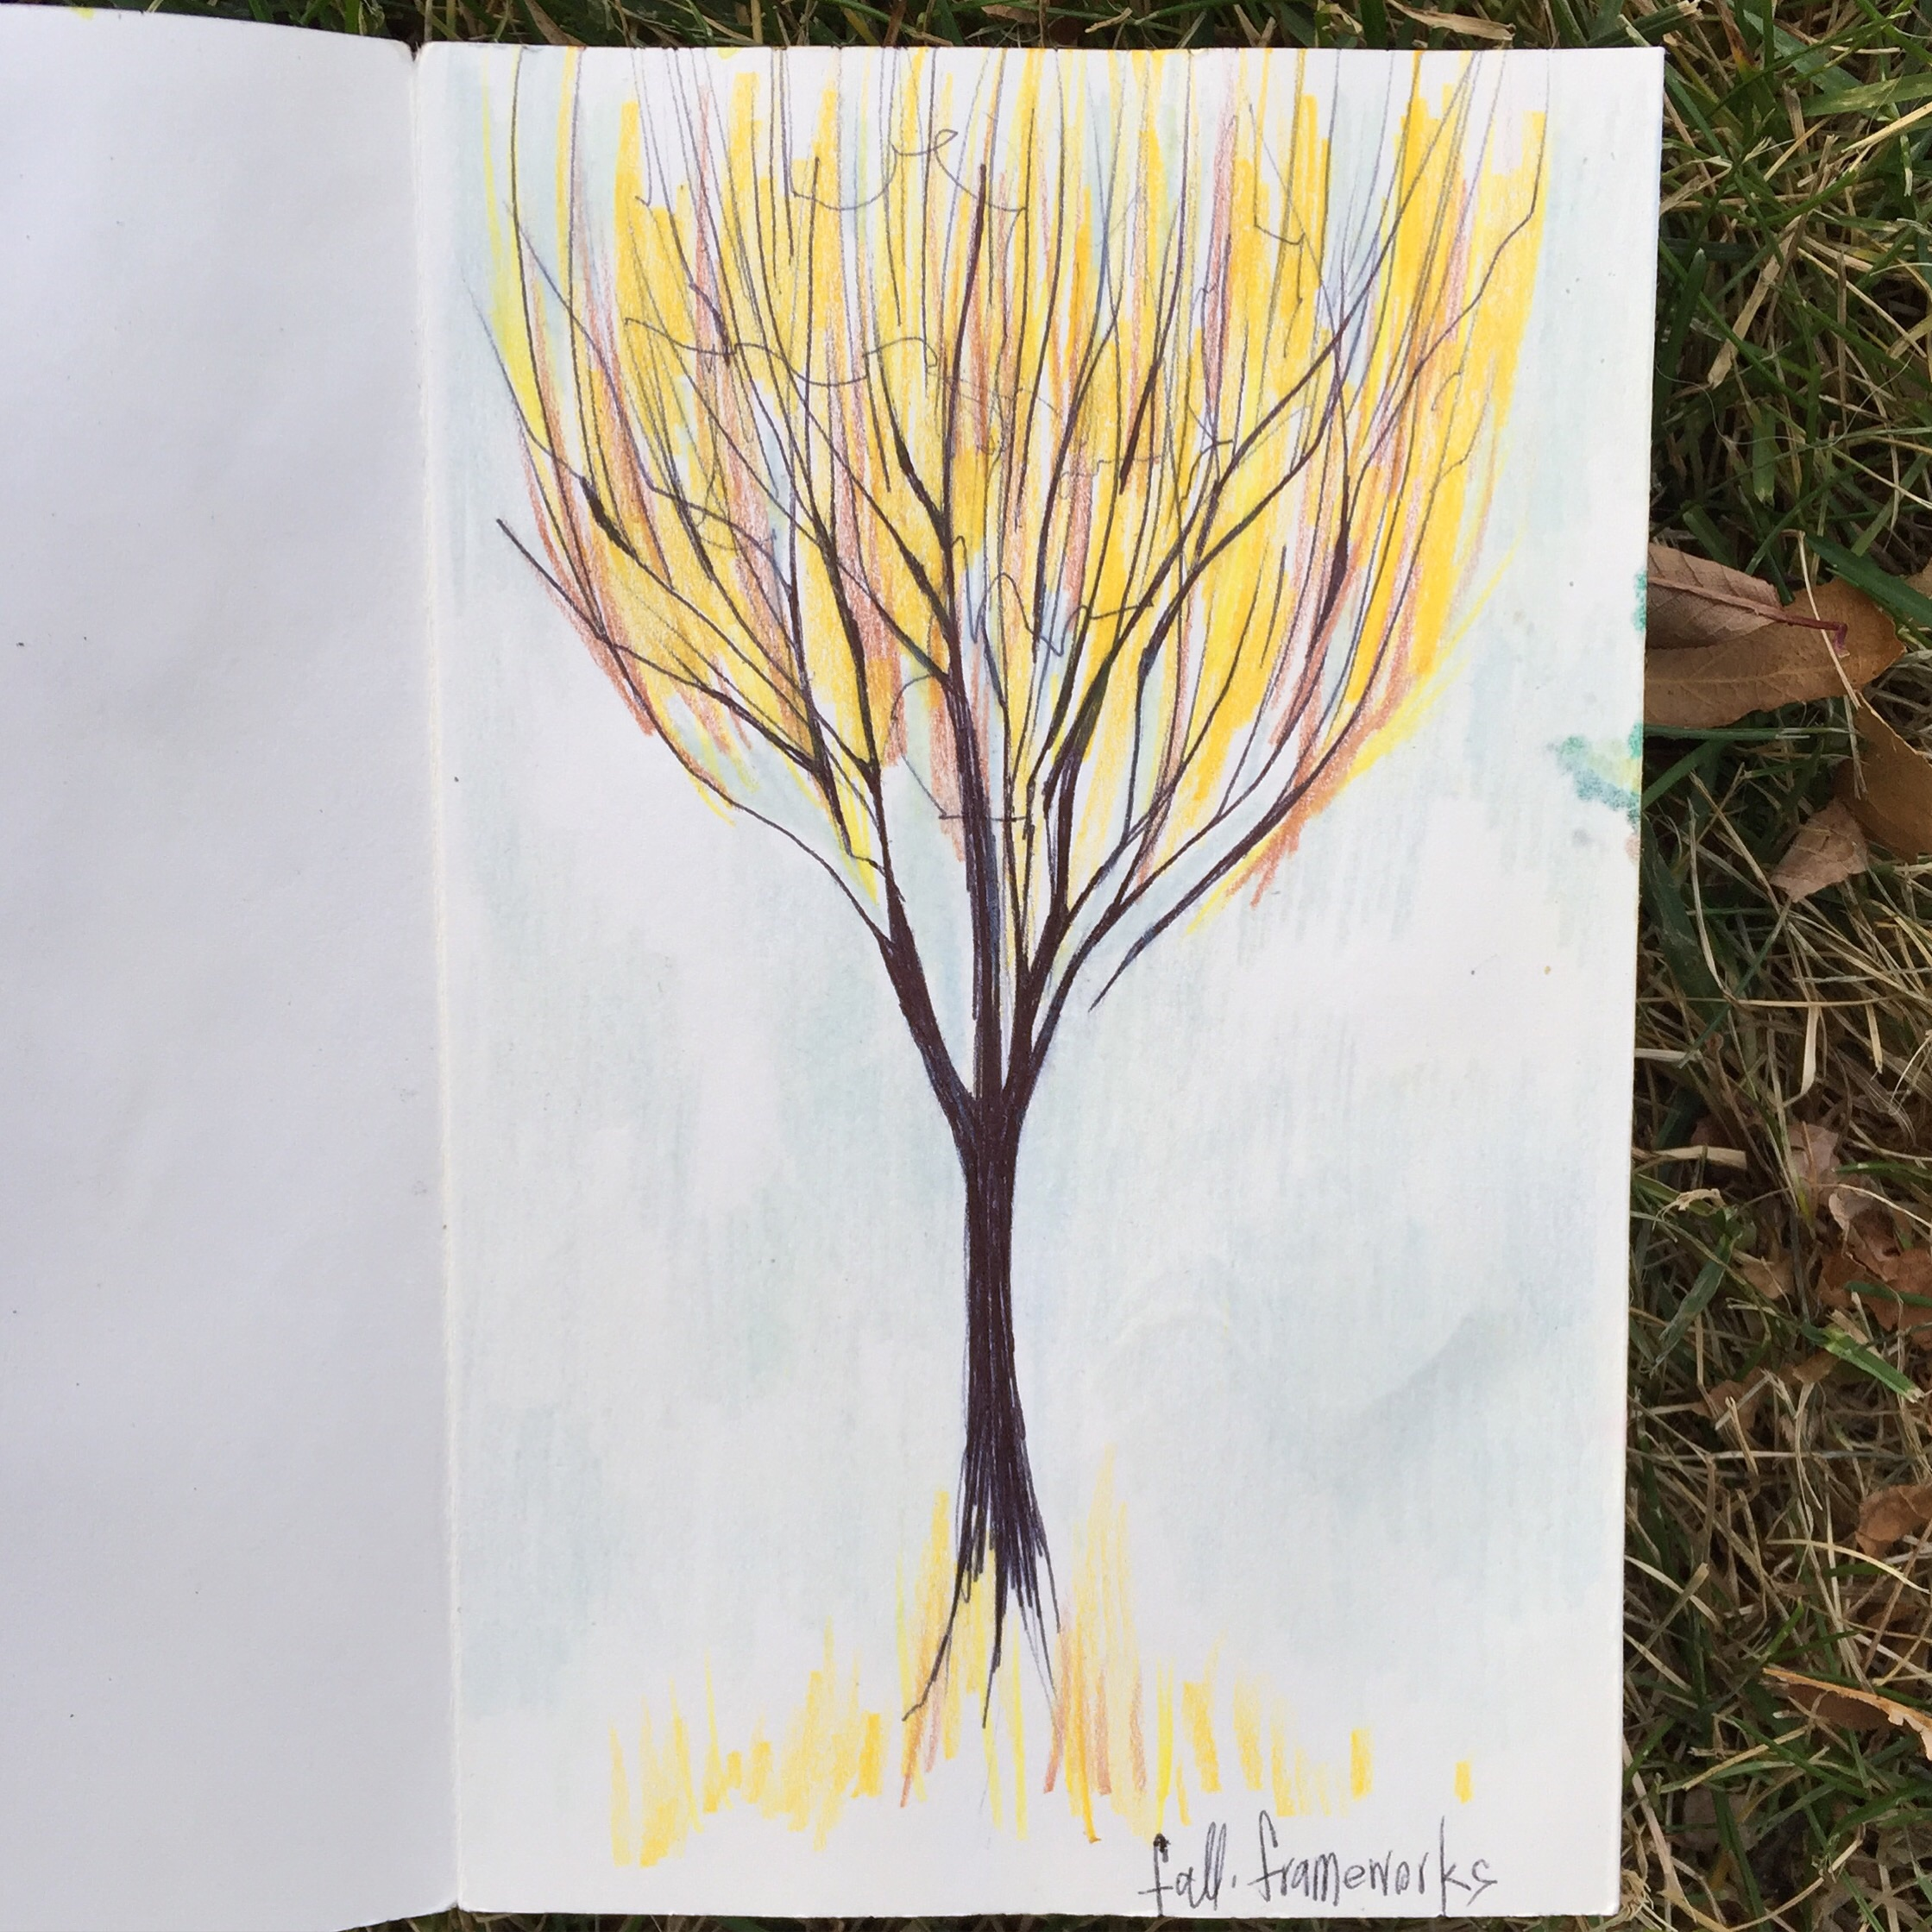 Ballpoint pen & pencil crayons